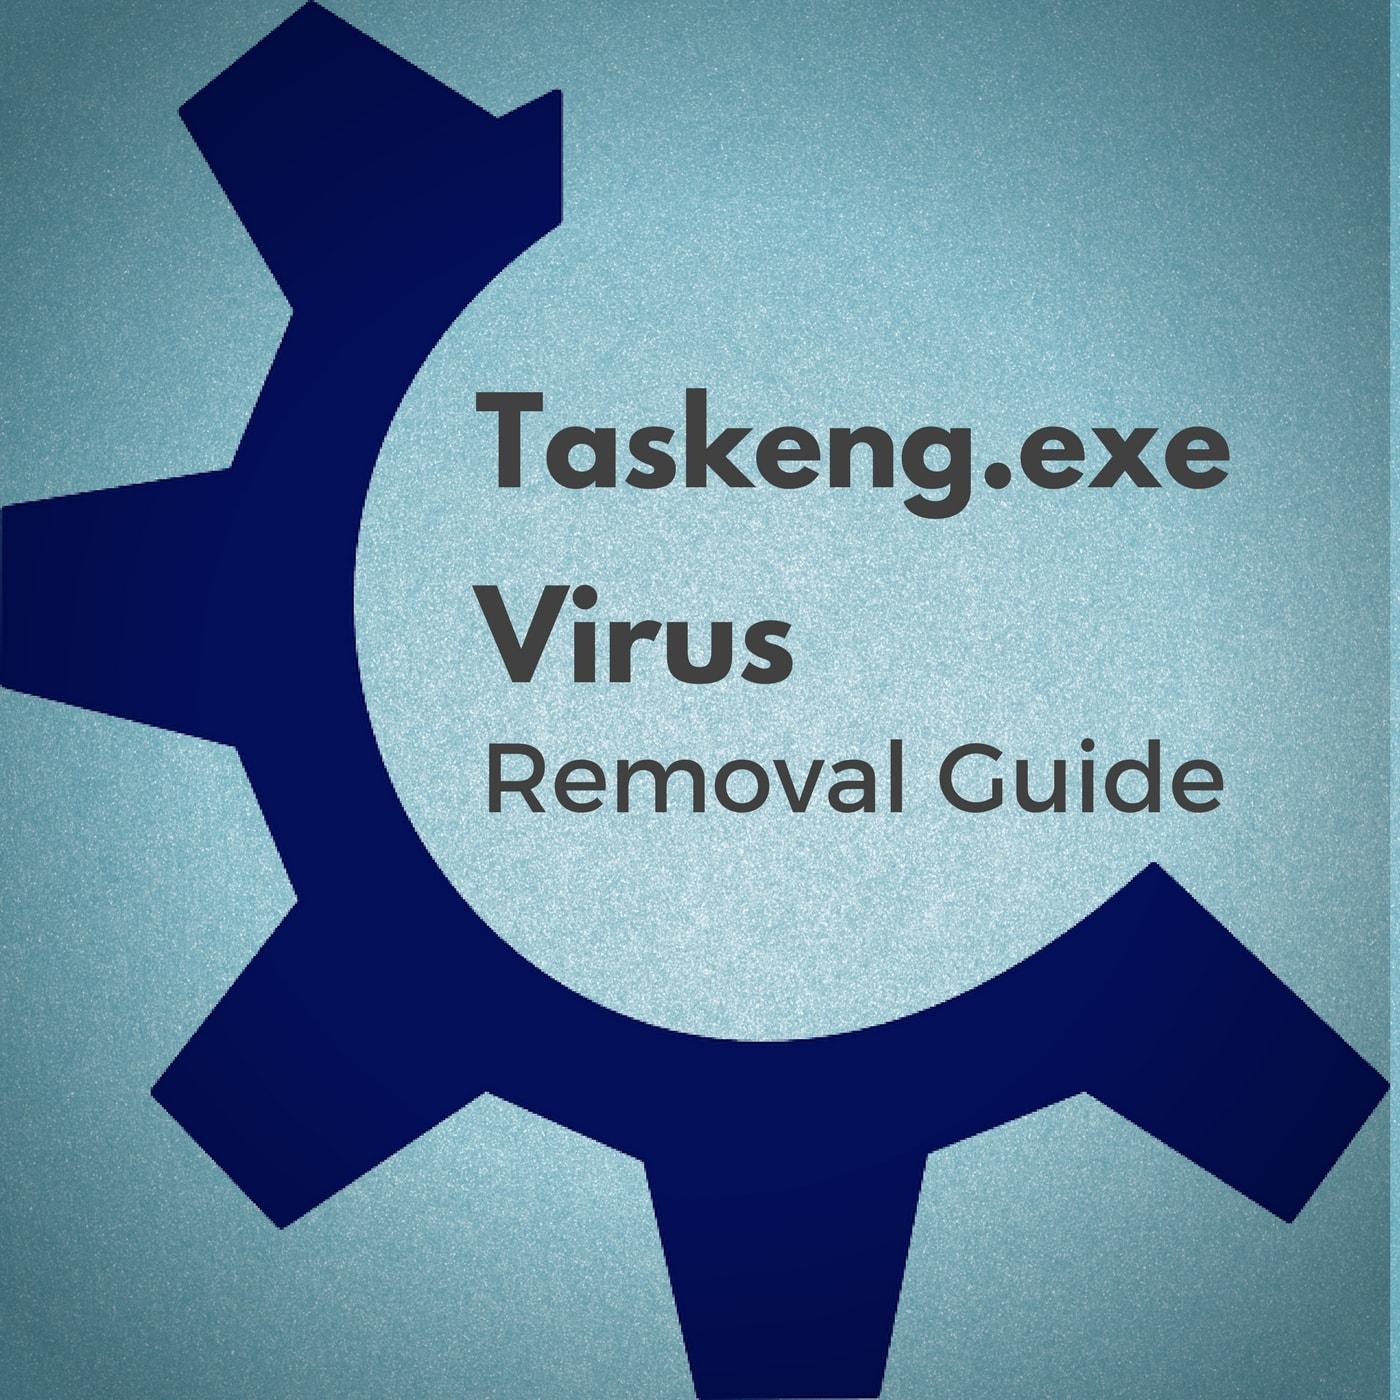 Taskeng.exe Virus Removal Guide